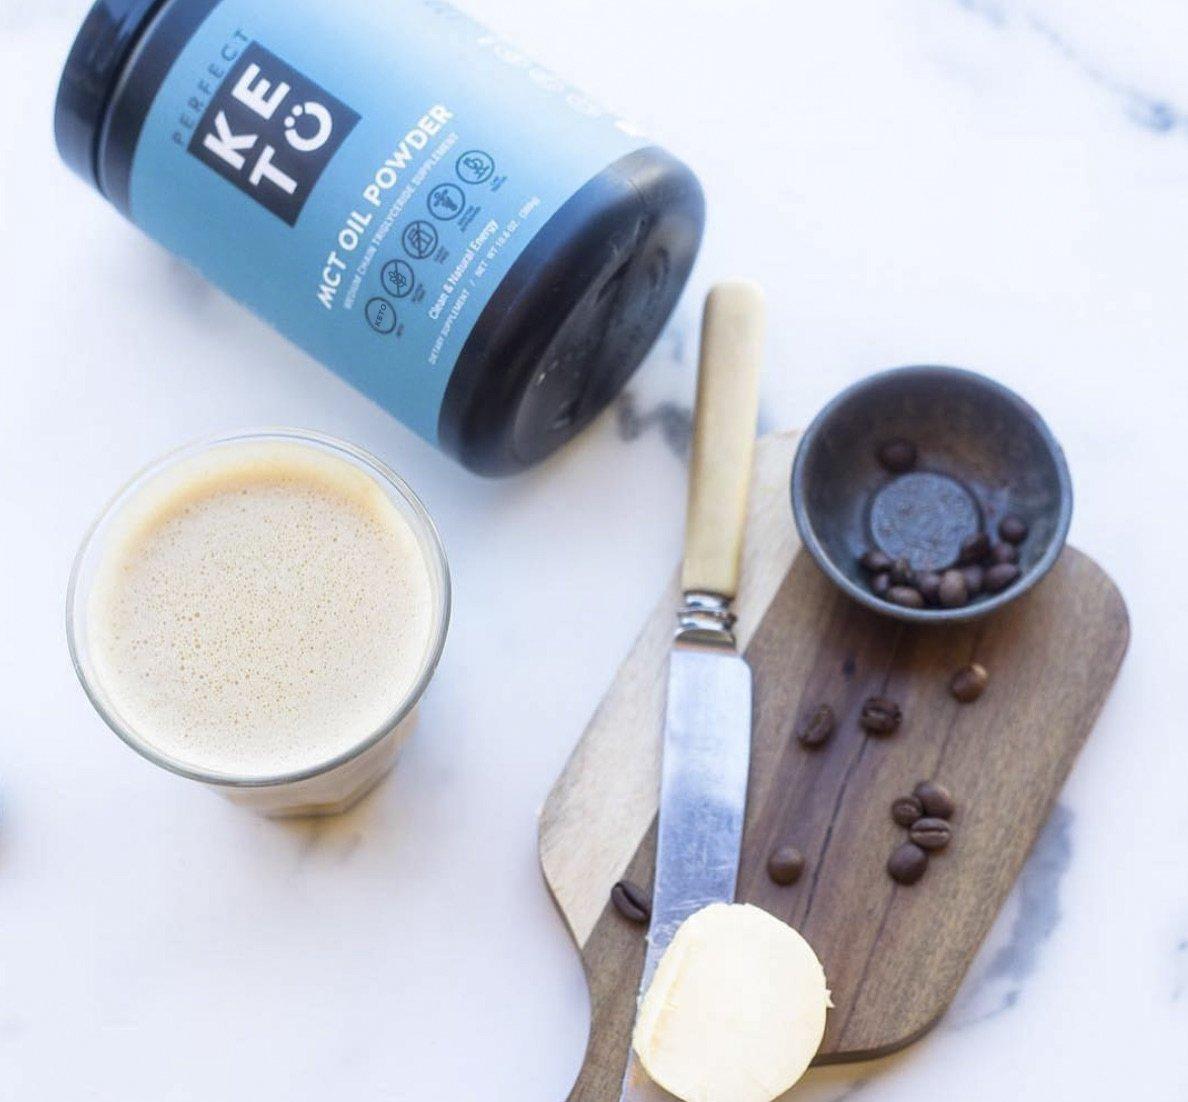 Perfect Keto MCT Oil Powder: Vanilla Ketosis Supplement (Medium Chain Triglycerides - Coconuts) for Ketone Energy - Paleo Natural Non Dairy Ketogenic Keto Coffee Creamer by Perfect Keto (Image #7)